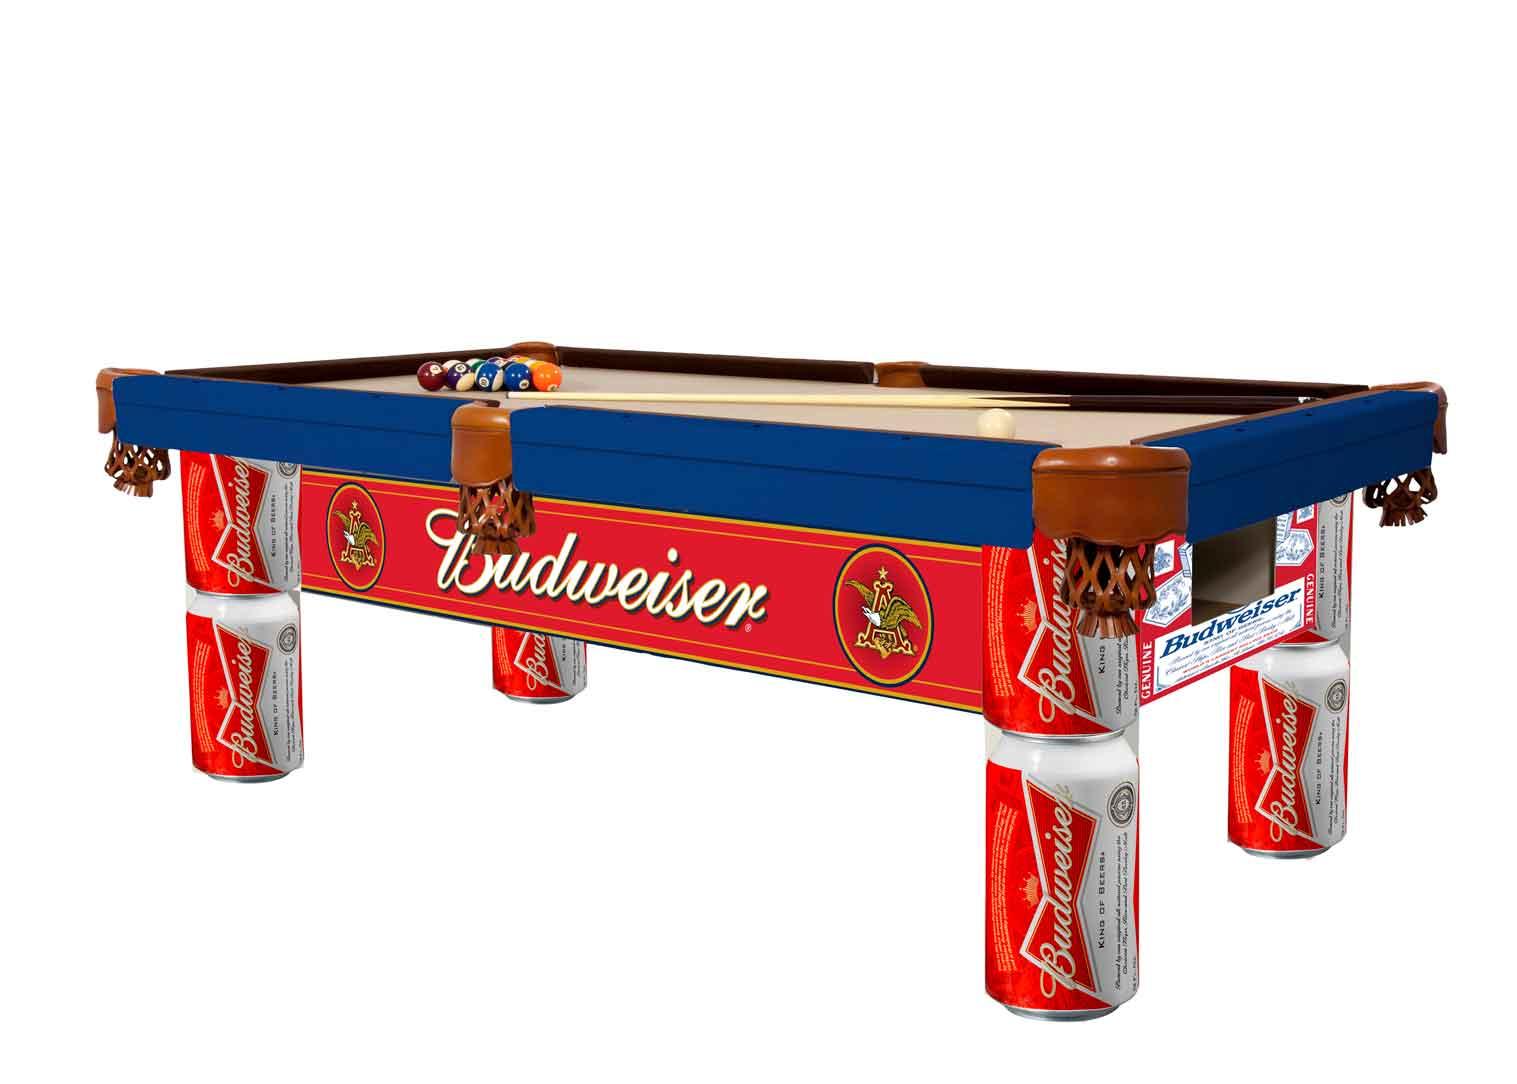 Custom outdoor pool table for Budweiser